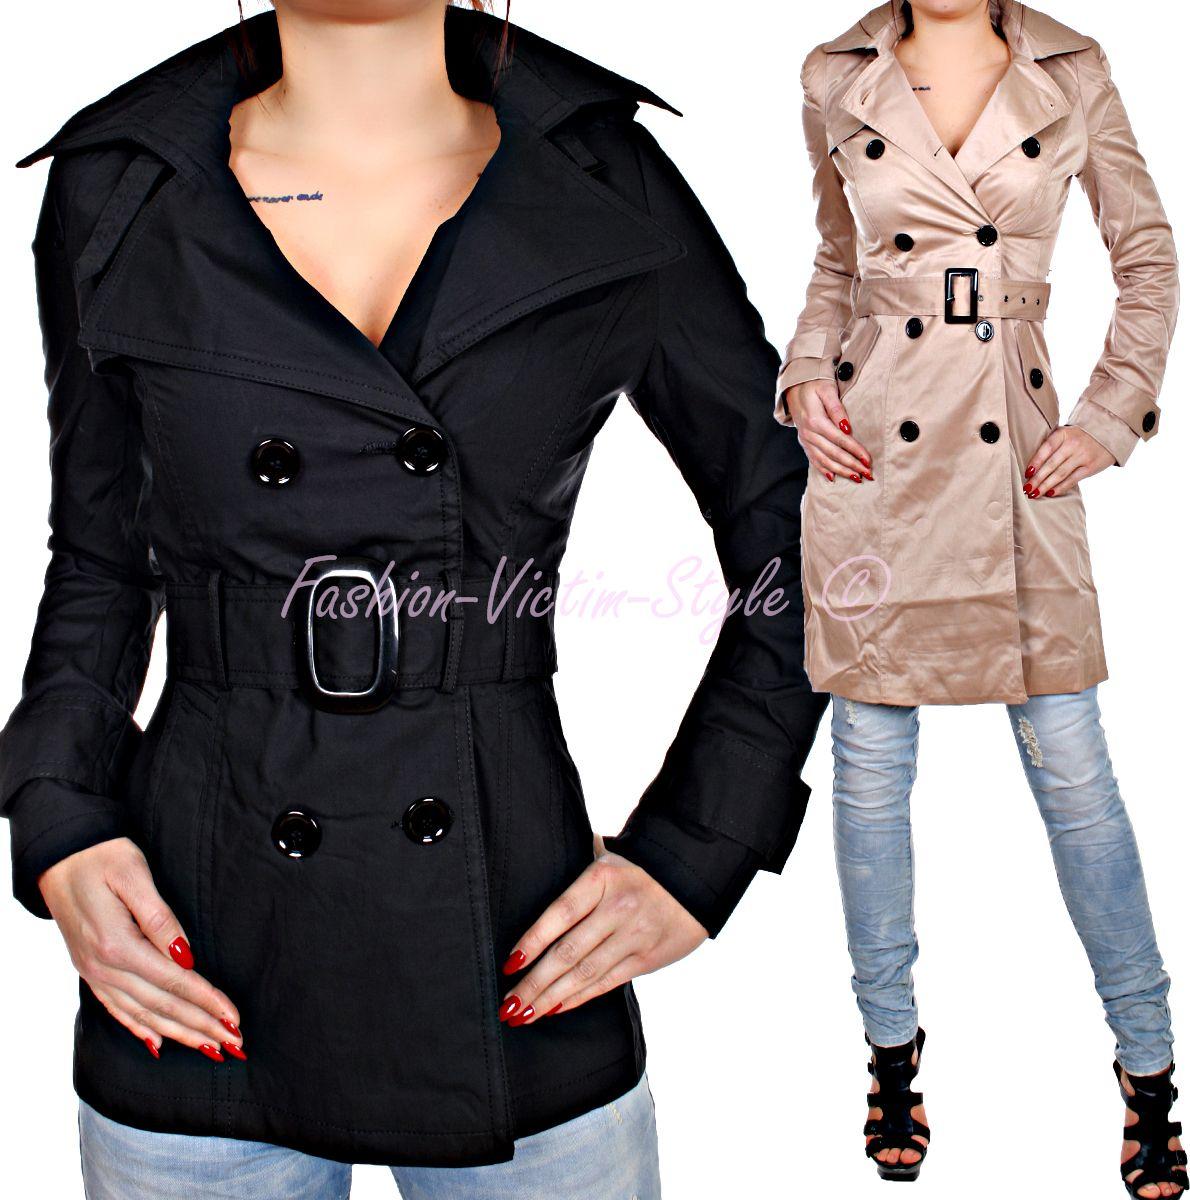 damen jacke trenchcoat mantel pea coat bergangs jacke. Black Bedroom Furniture Sets. Home Design Ideas